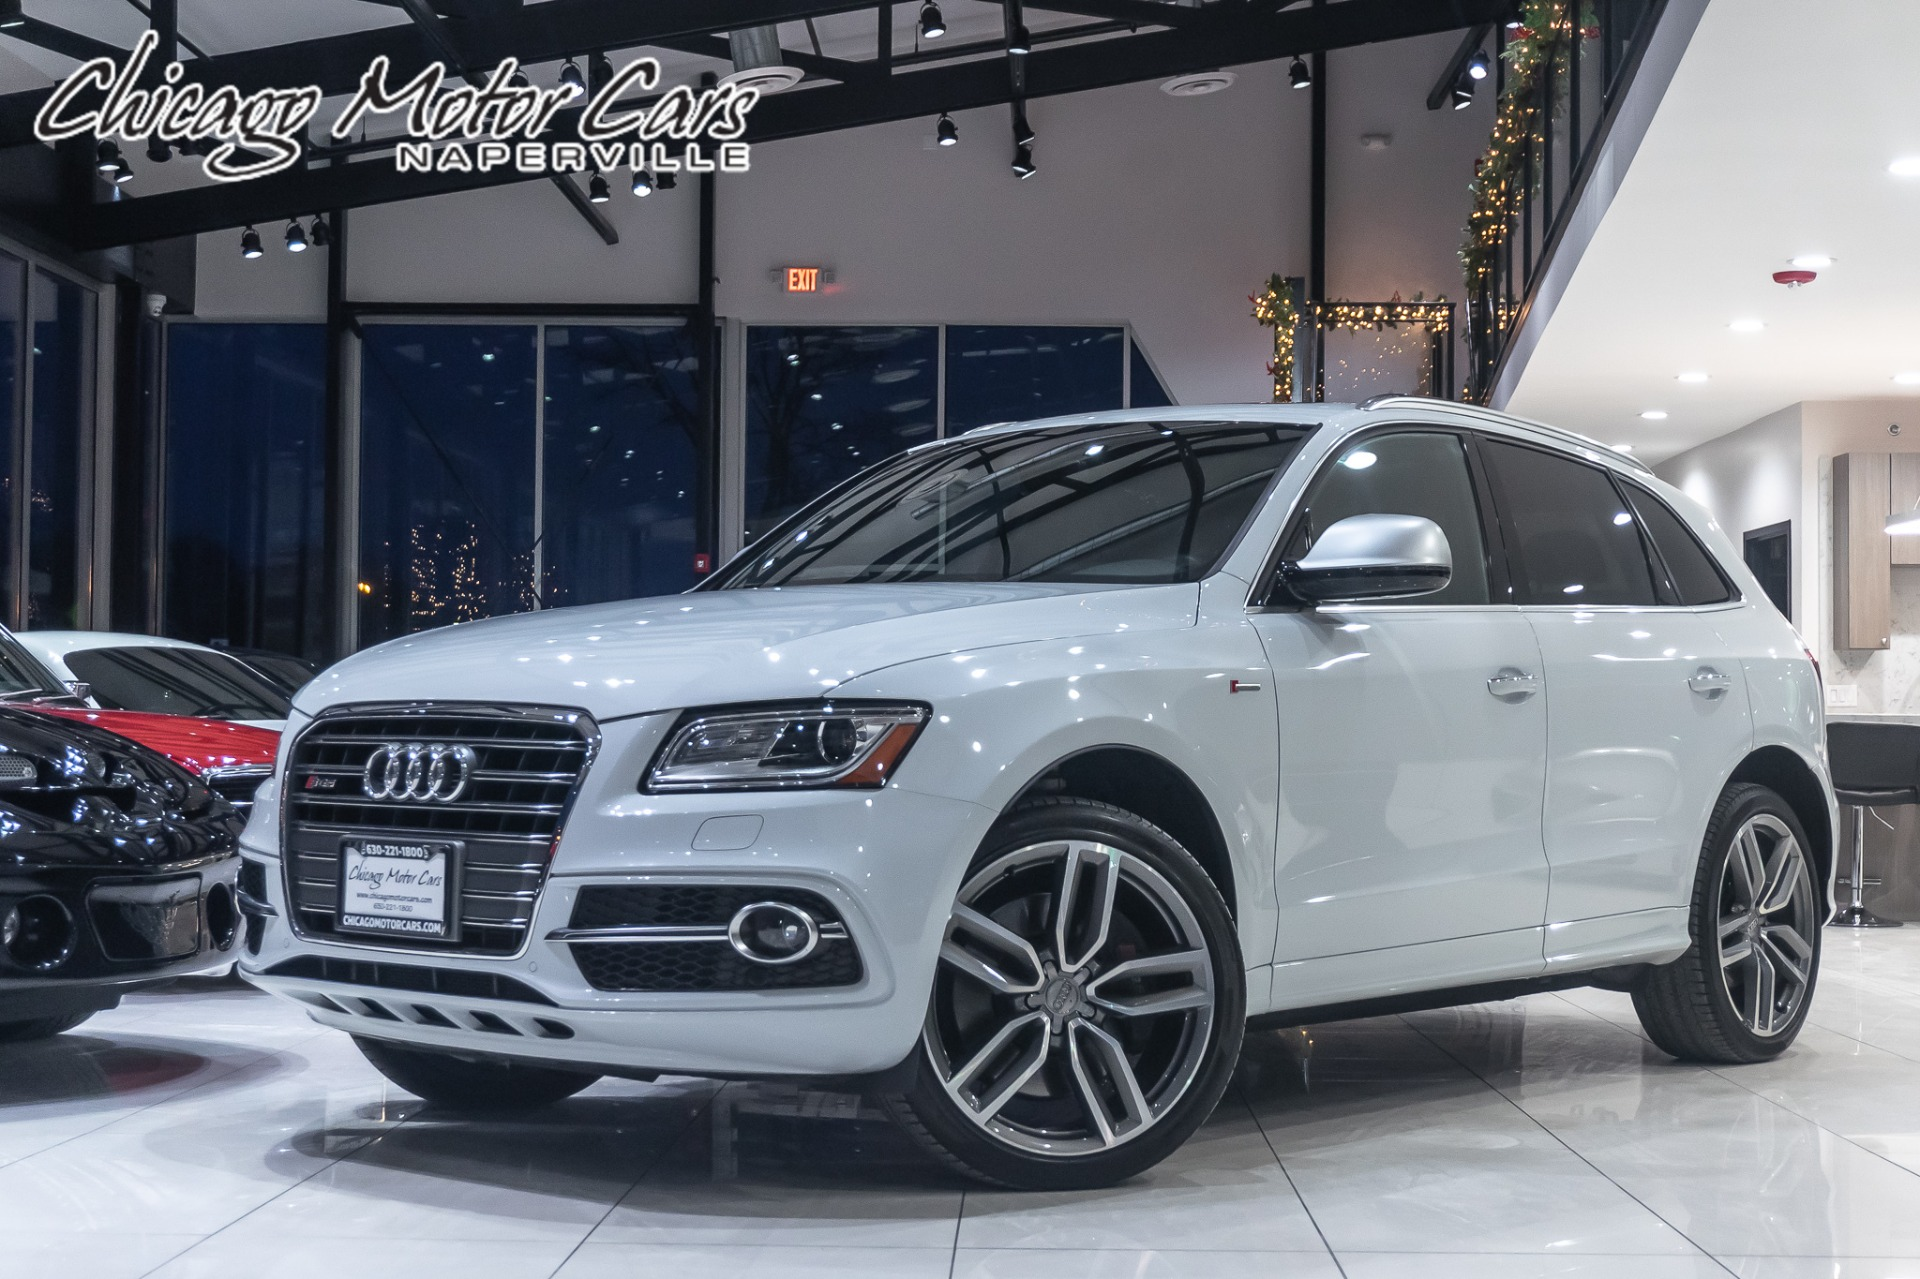 Kelebihan Audi 2017 Top Model Tahun Ini